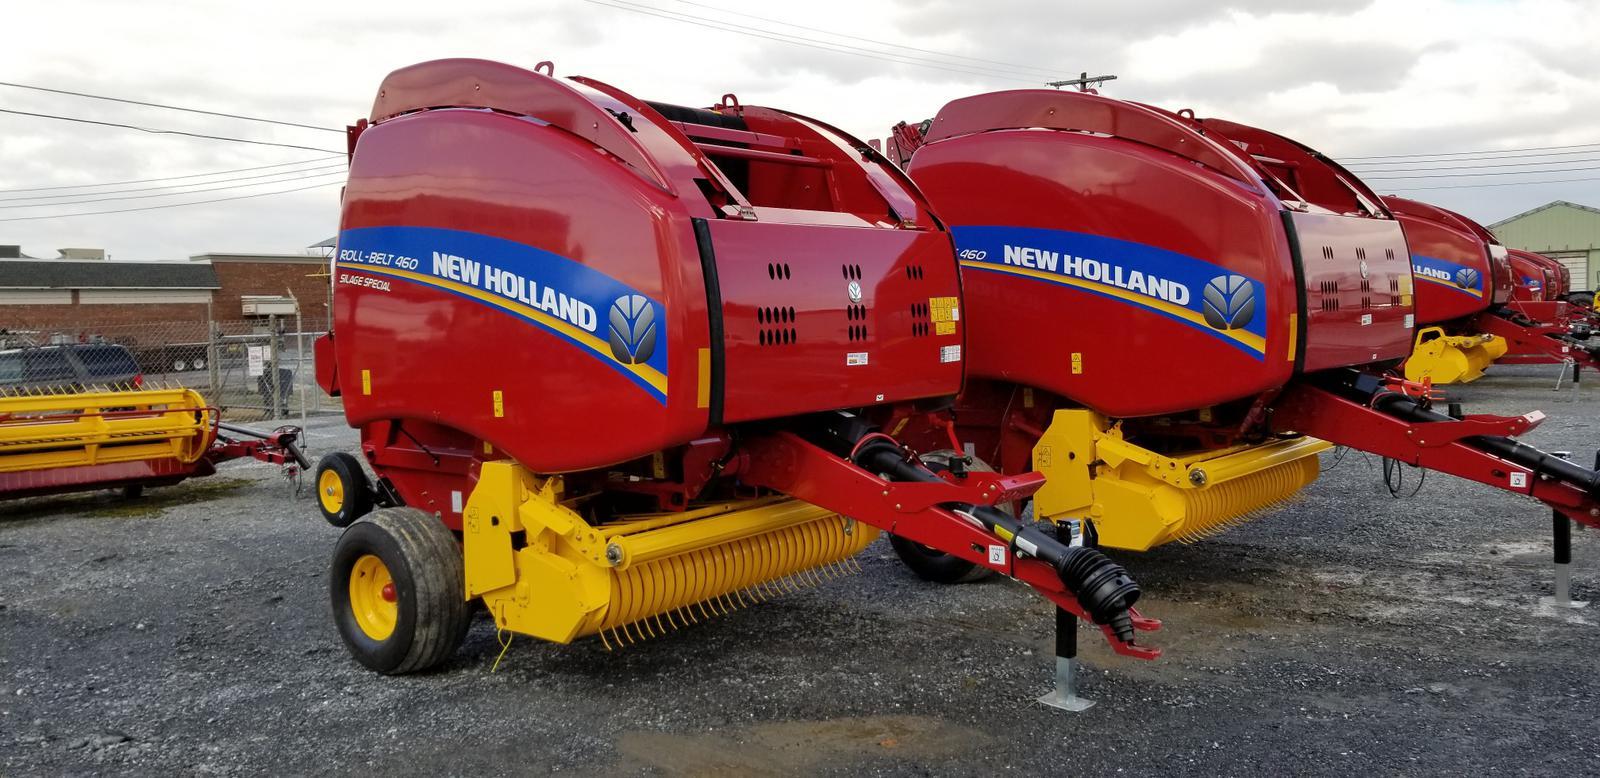 2018 New Holland Agriculture Roll-Belt™ Round Baler Roll-Belt™ 460